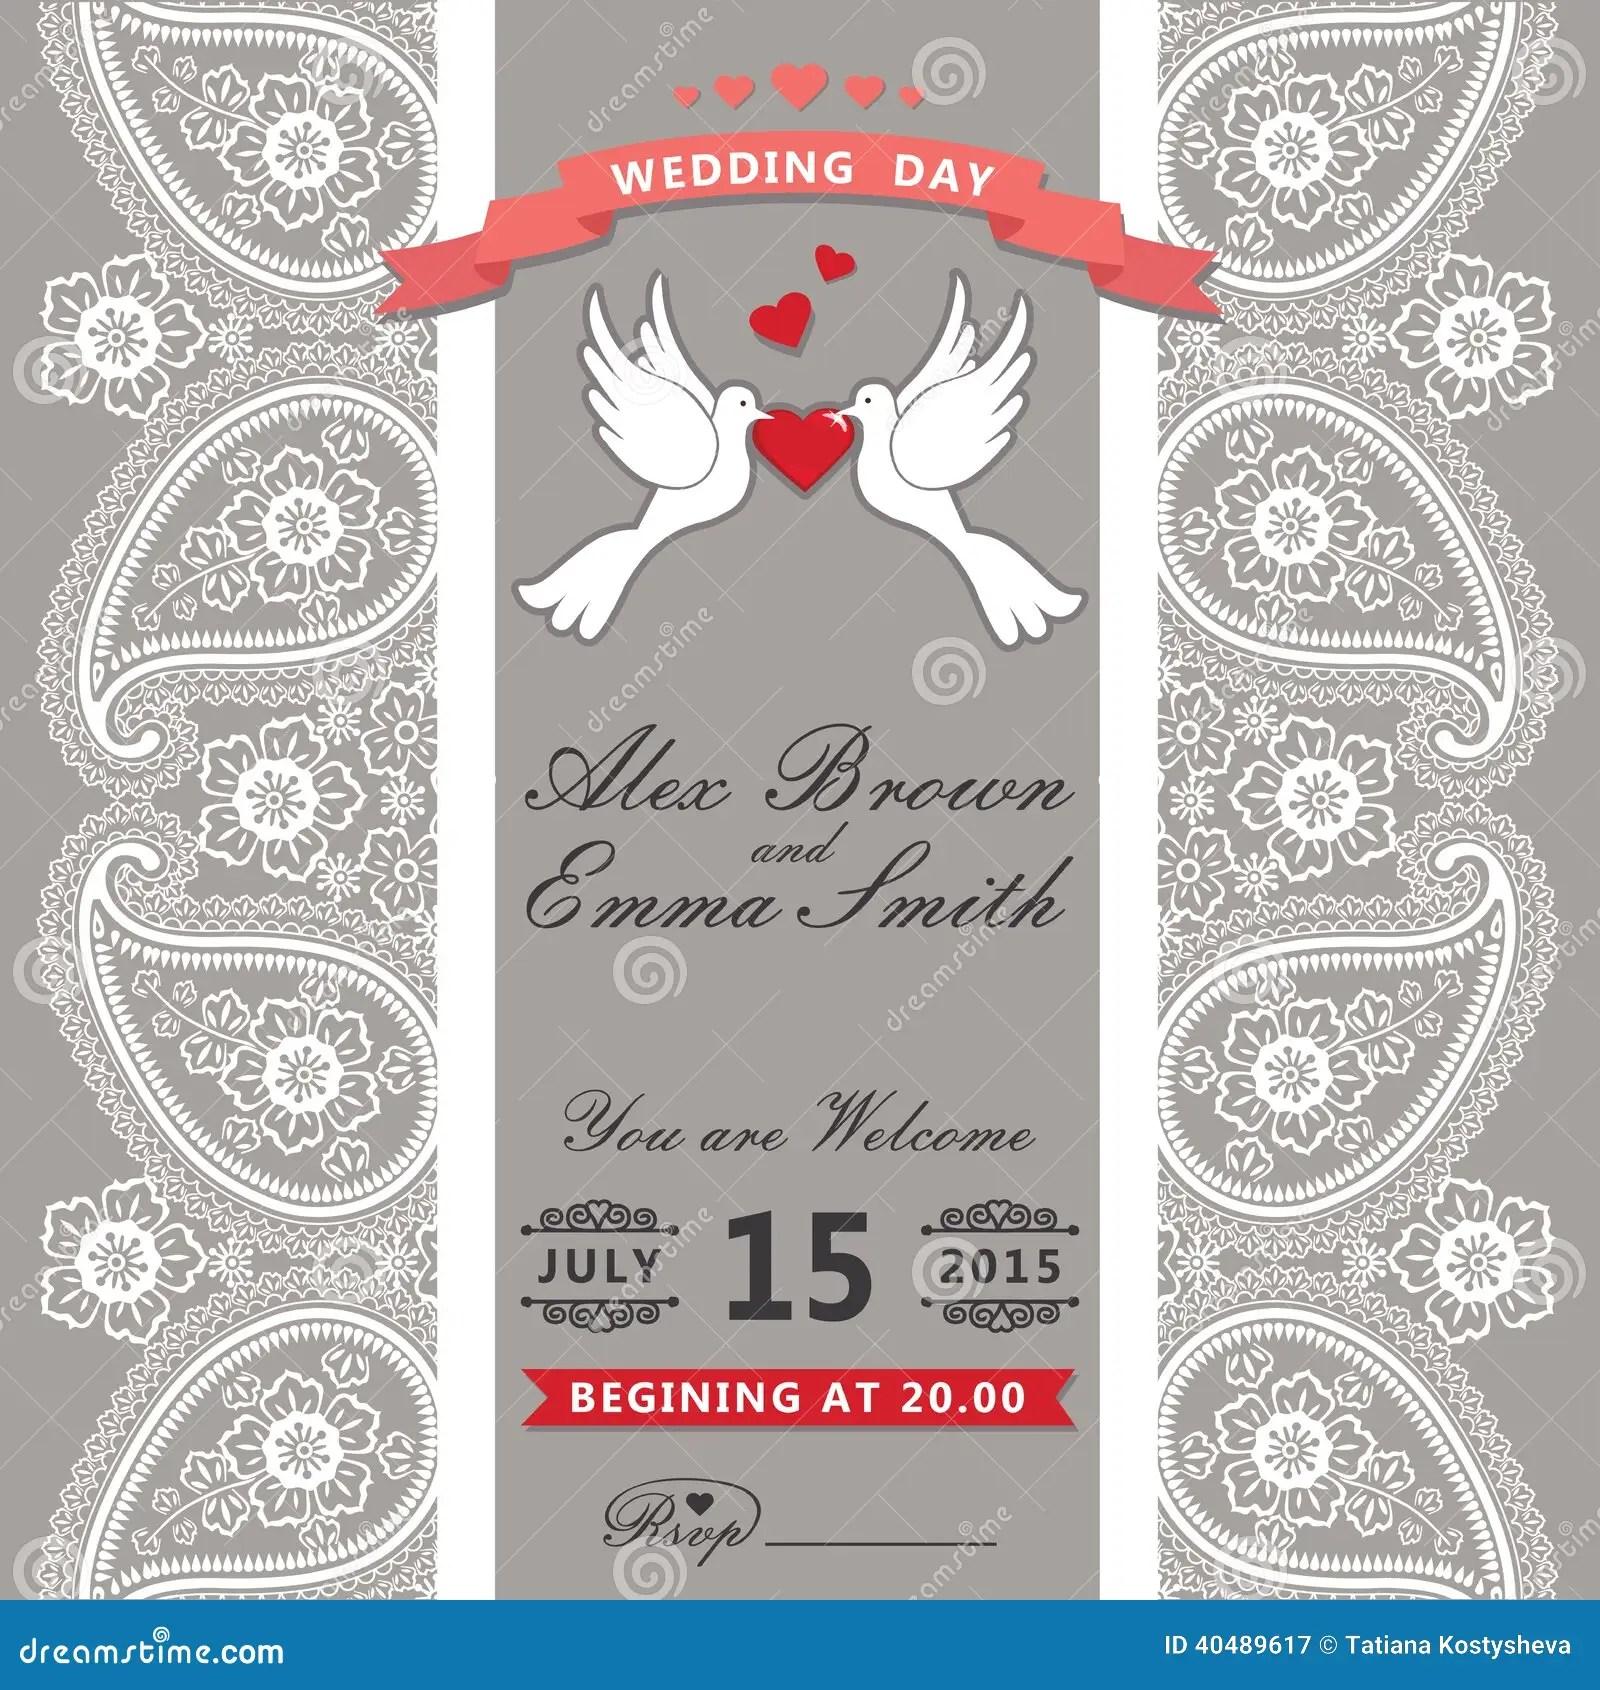 Cute Wedding Cartoon Wallpaper Cute Wedding Invitation Paisley Border Lace Cartoon